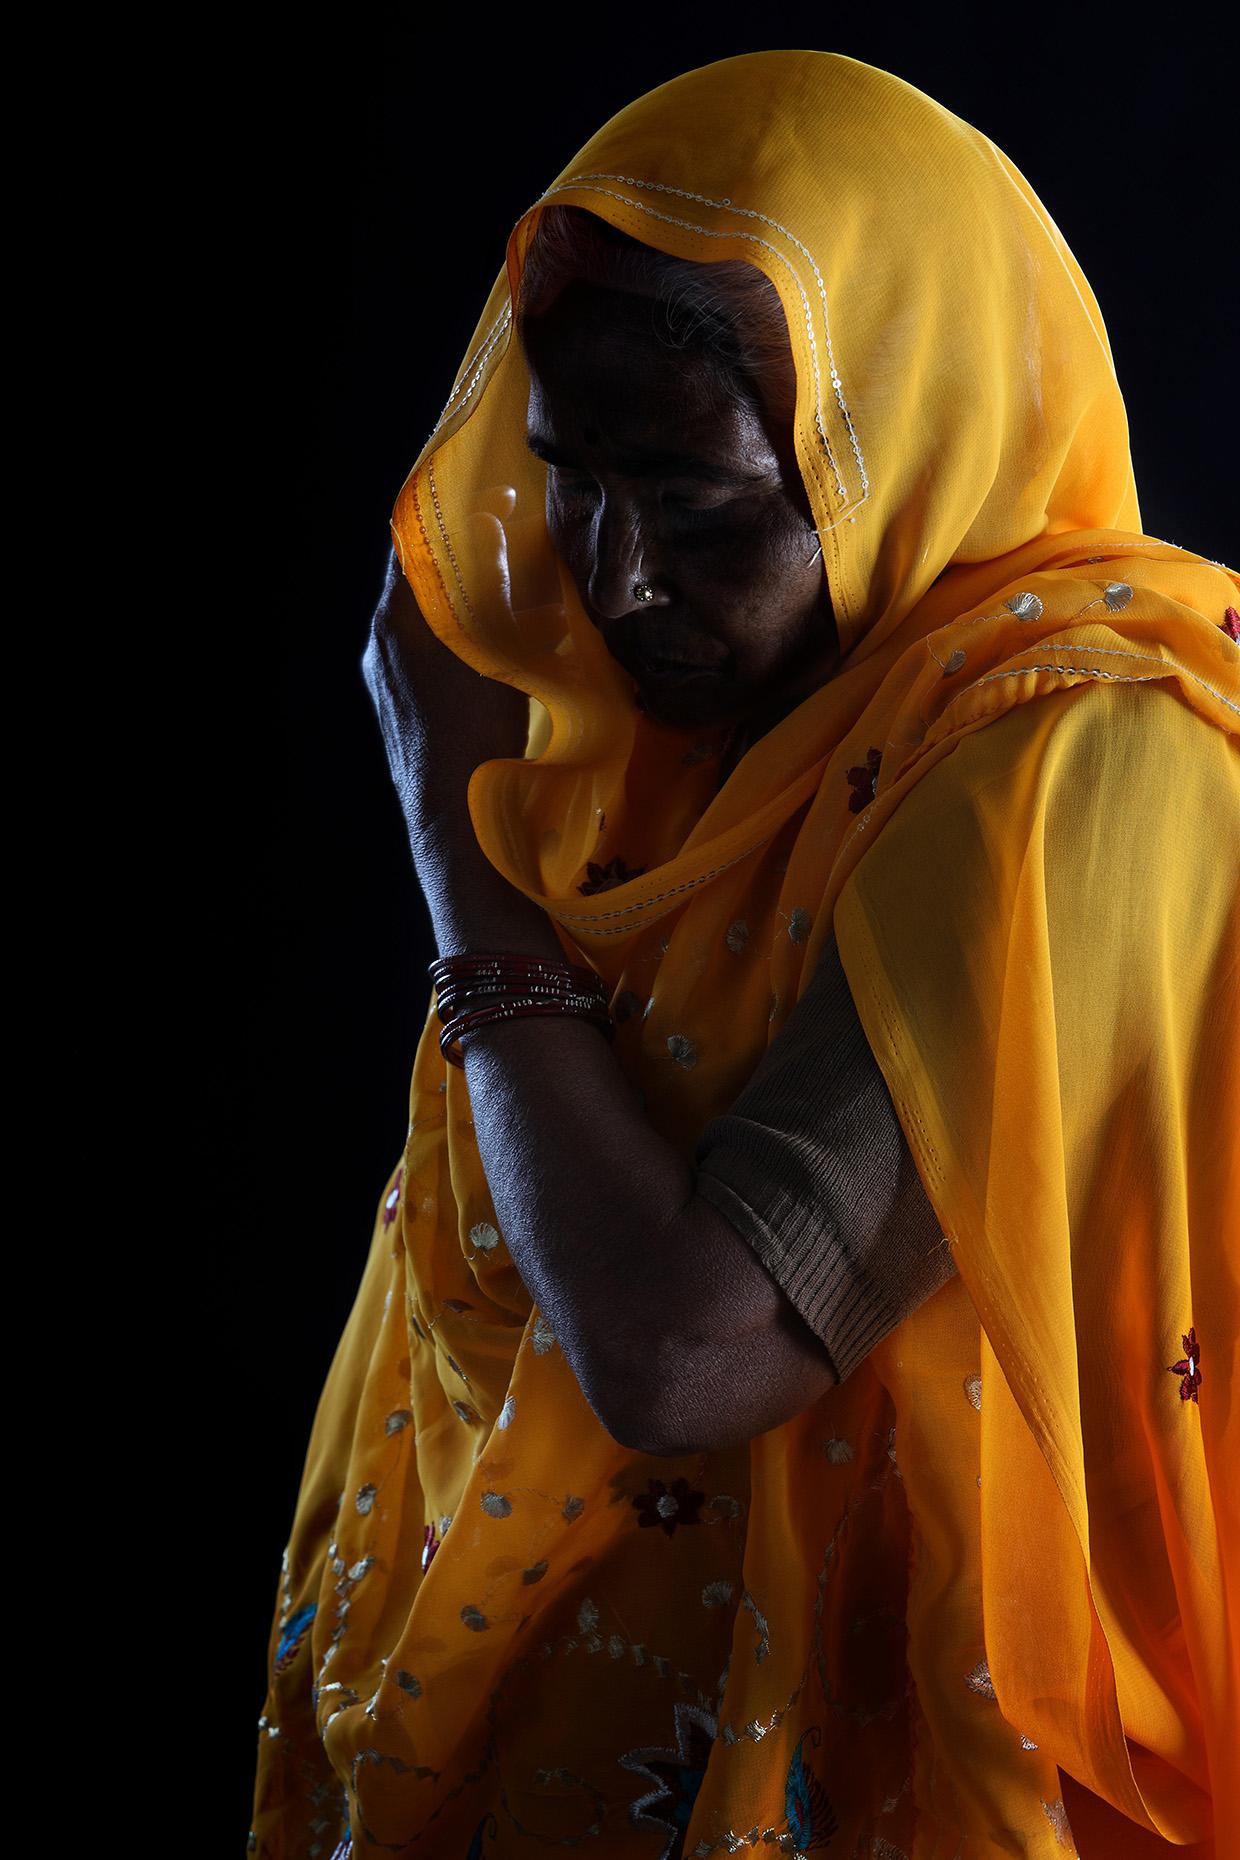 Portrait of old woman wearing a yellow sari at the Kumbh Mela